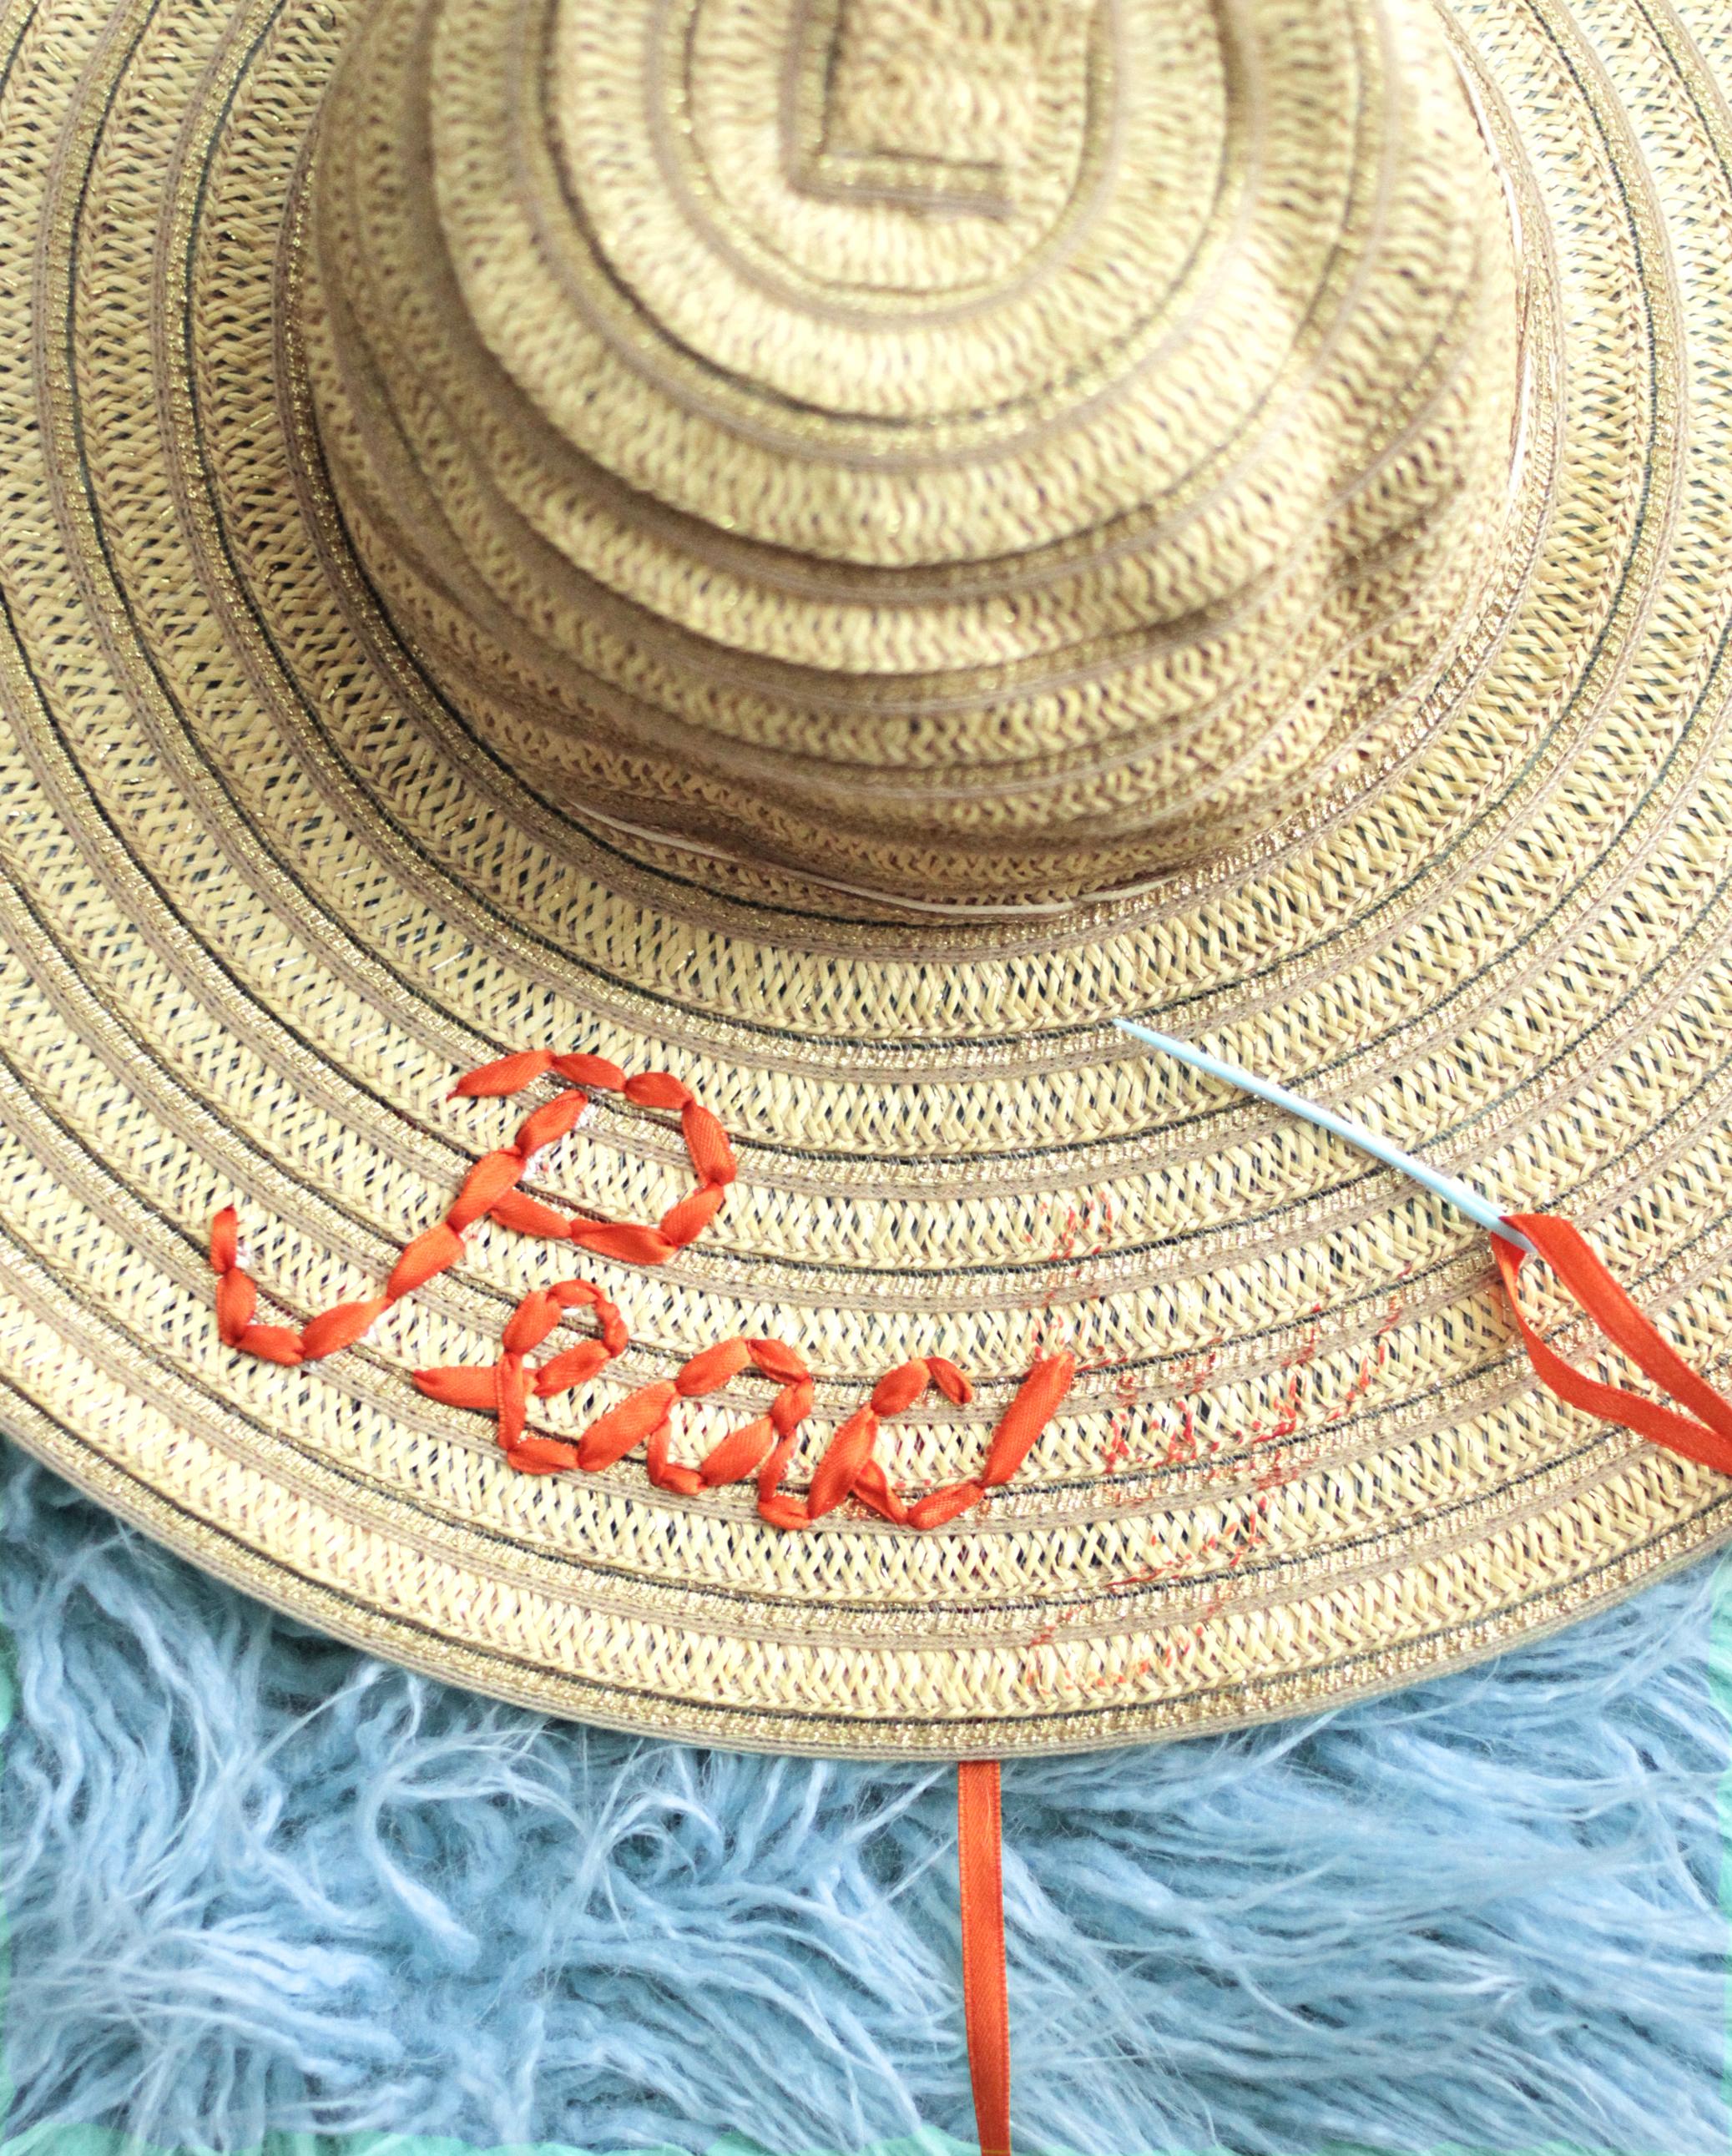 Sun Hat DIY Step 3